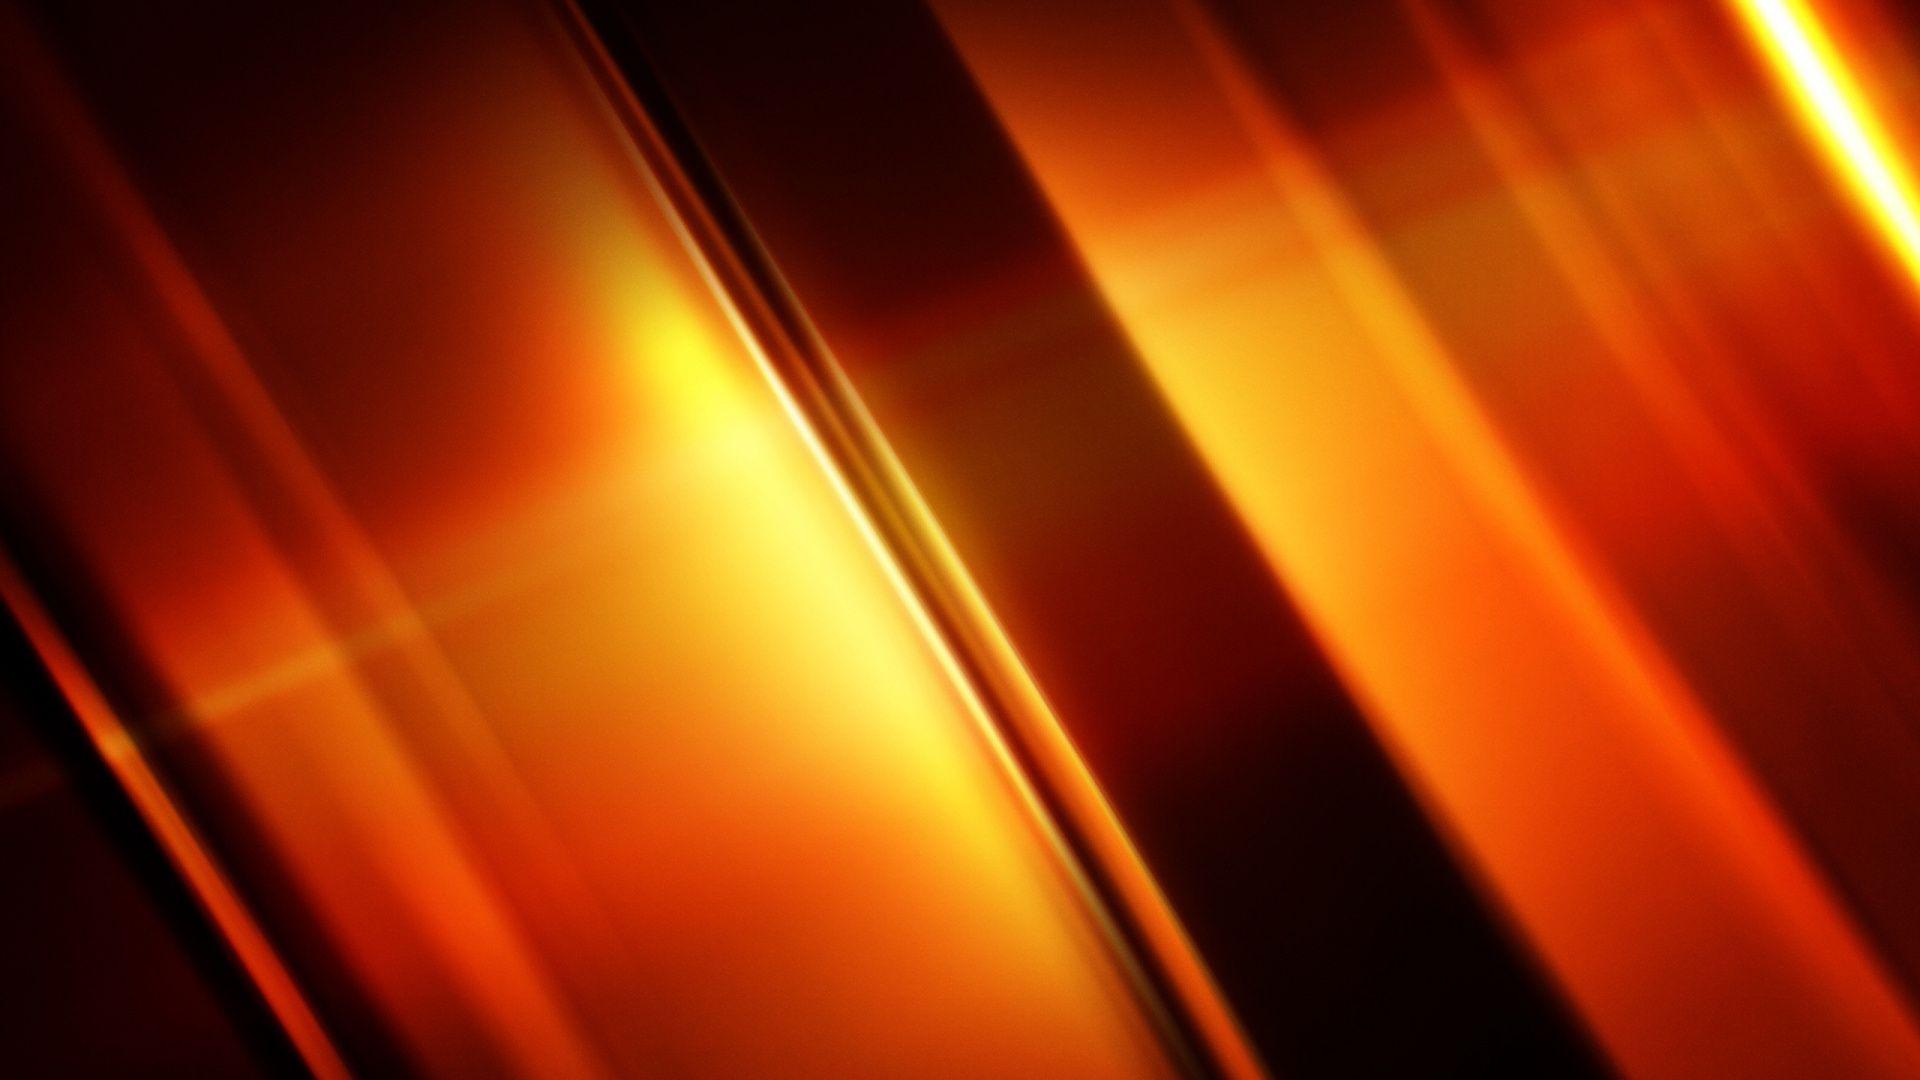 Orange hd wallpaper for laptop